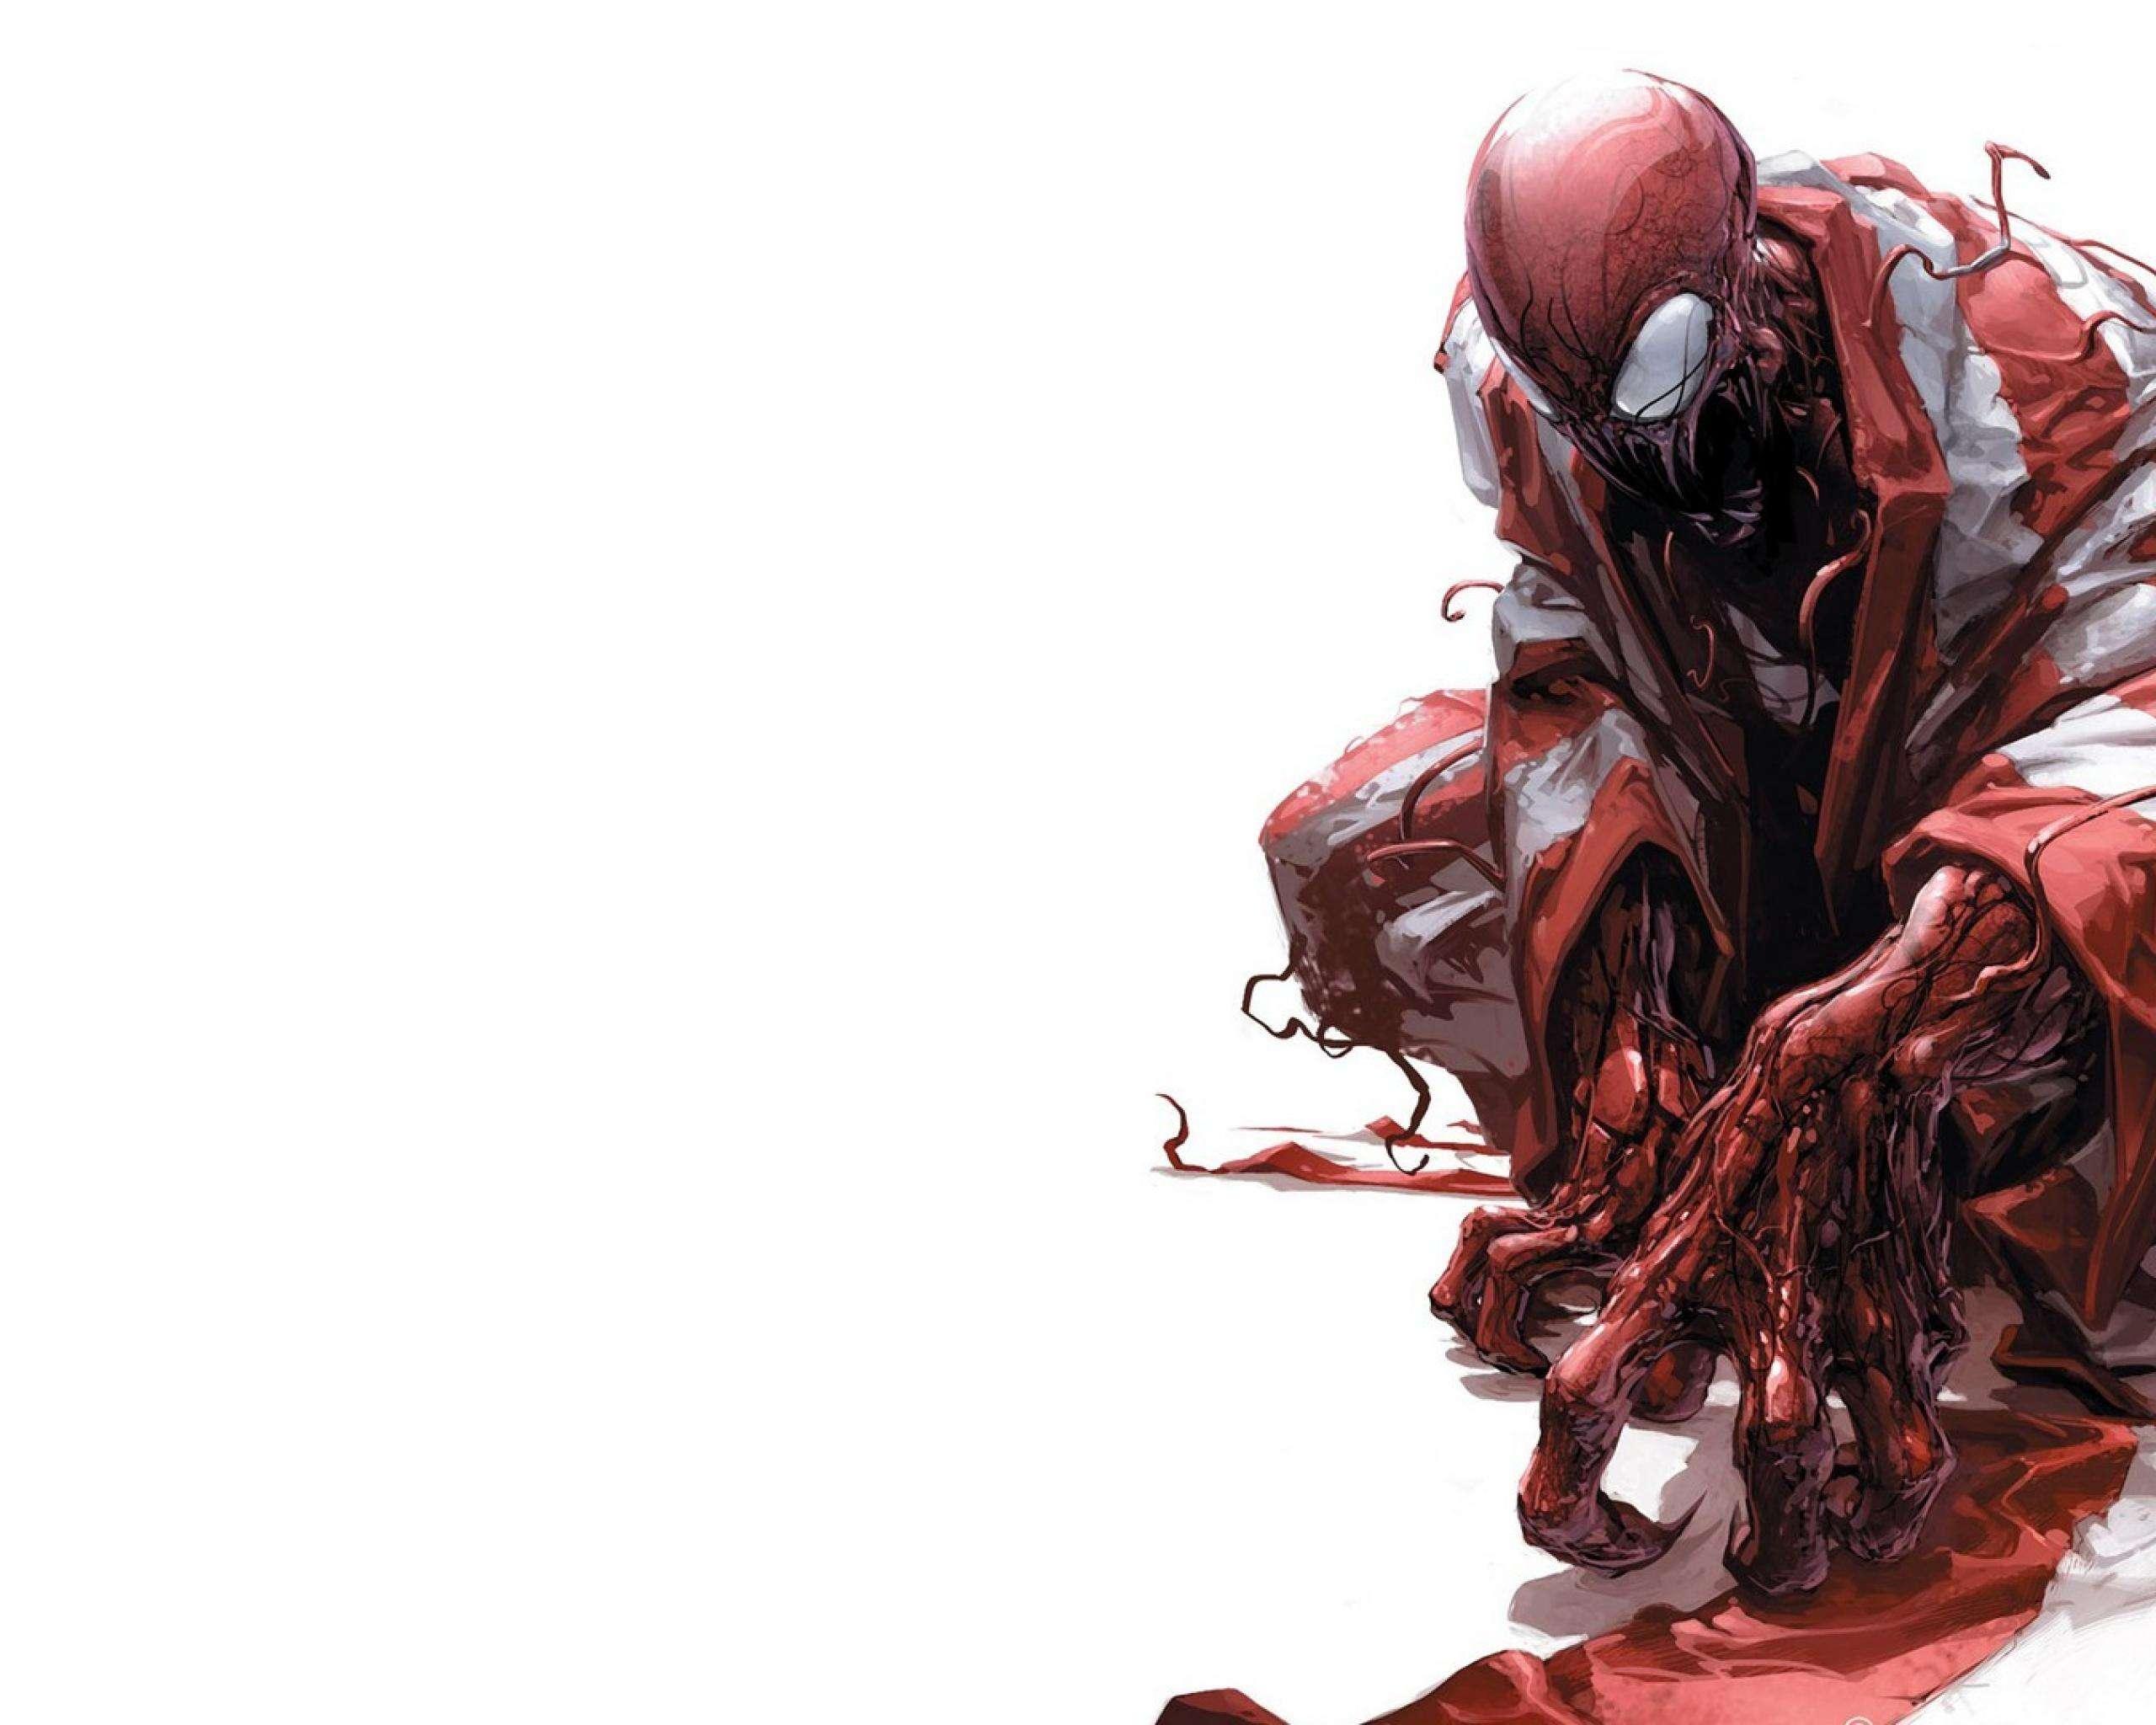 Marvel Cool Carnage Wallpaper 2560x2048